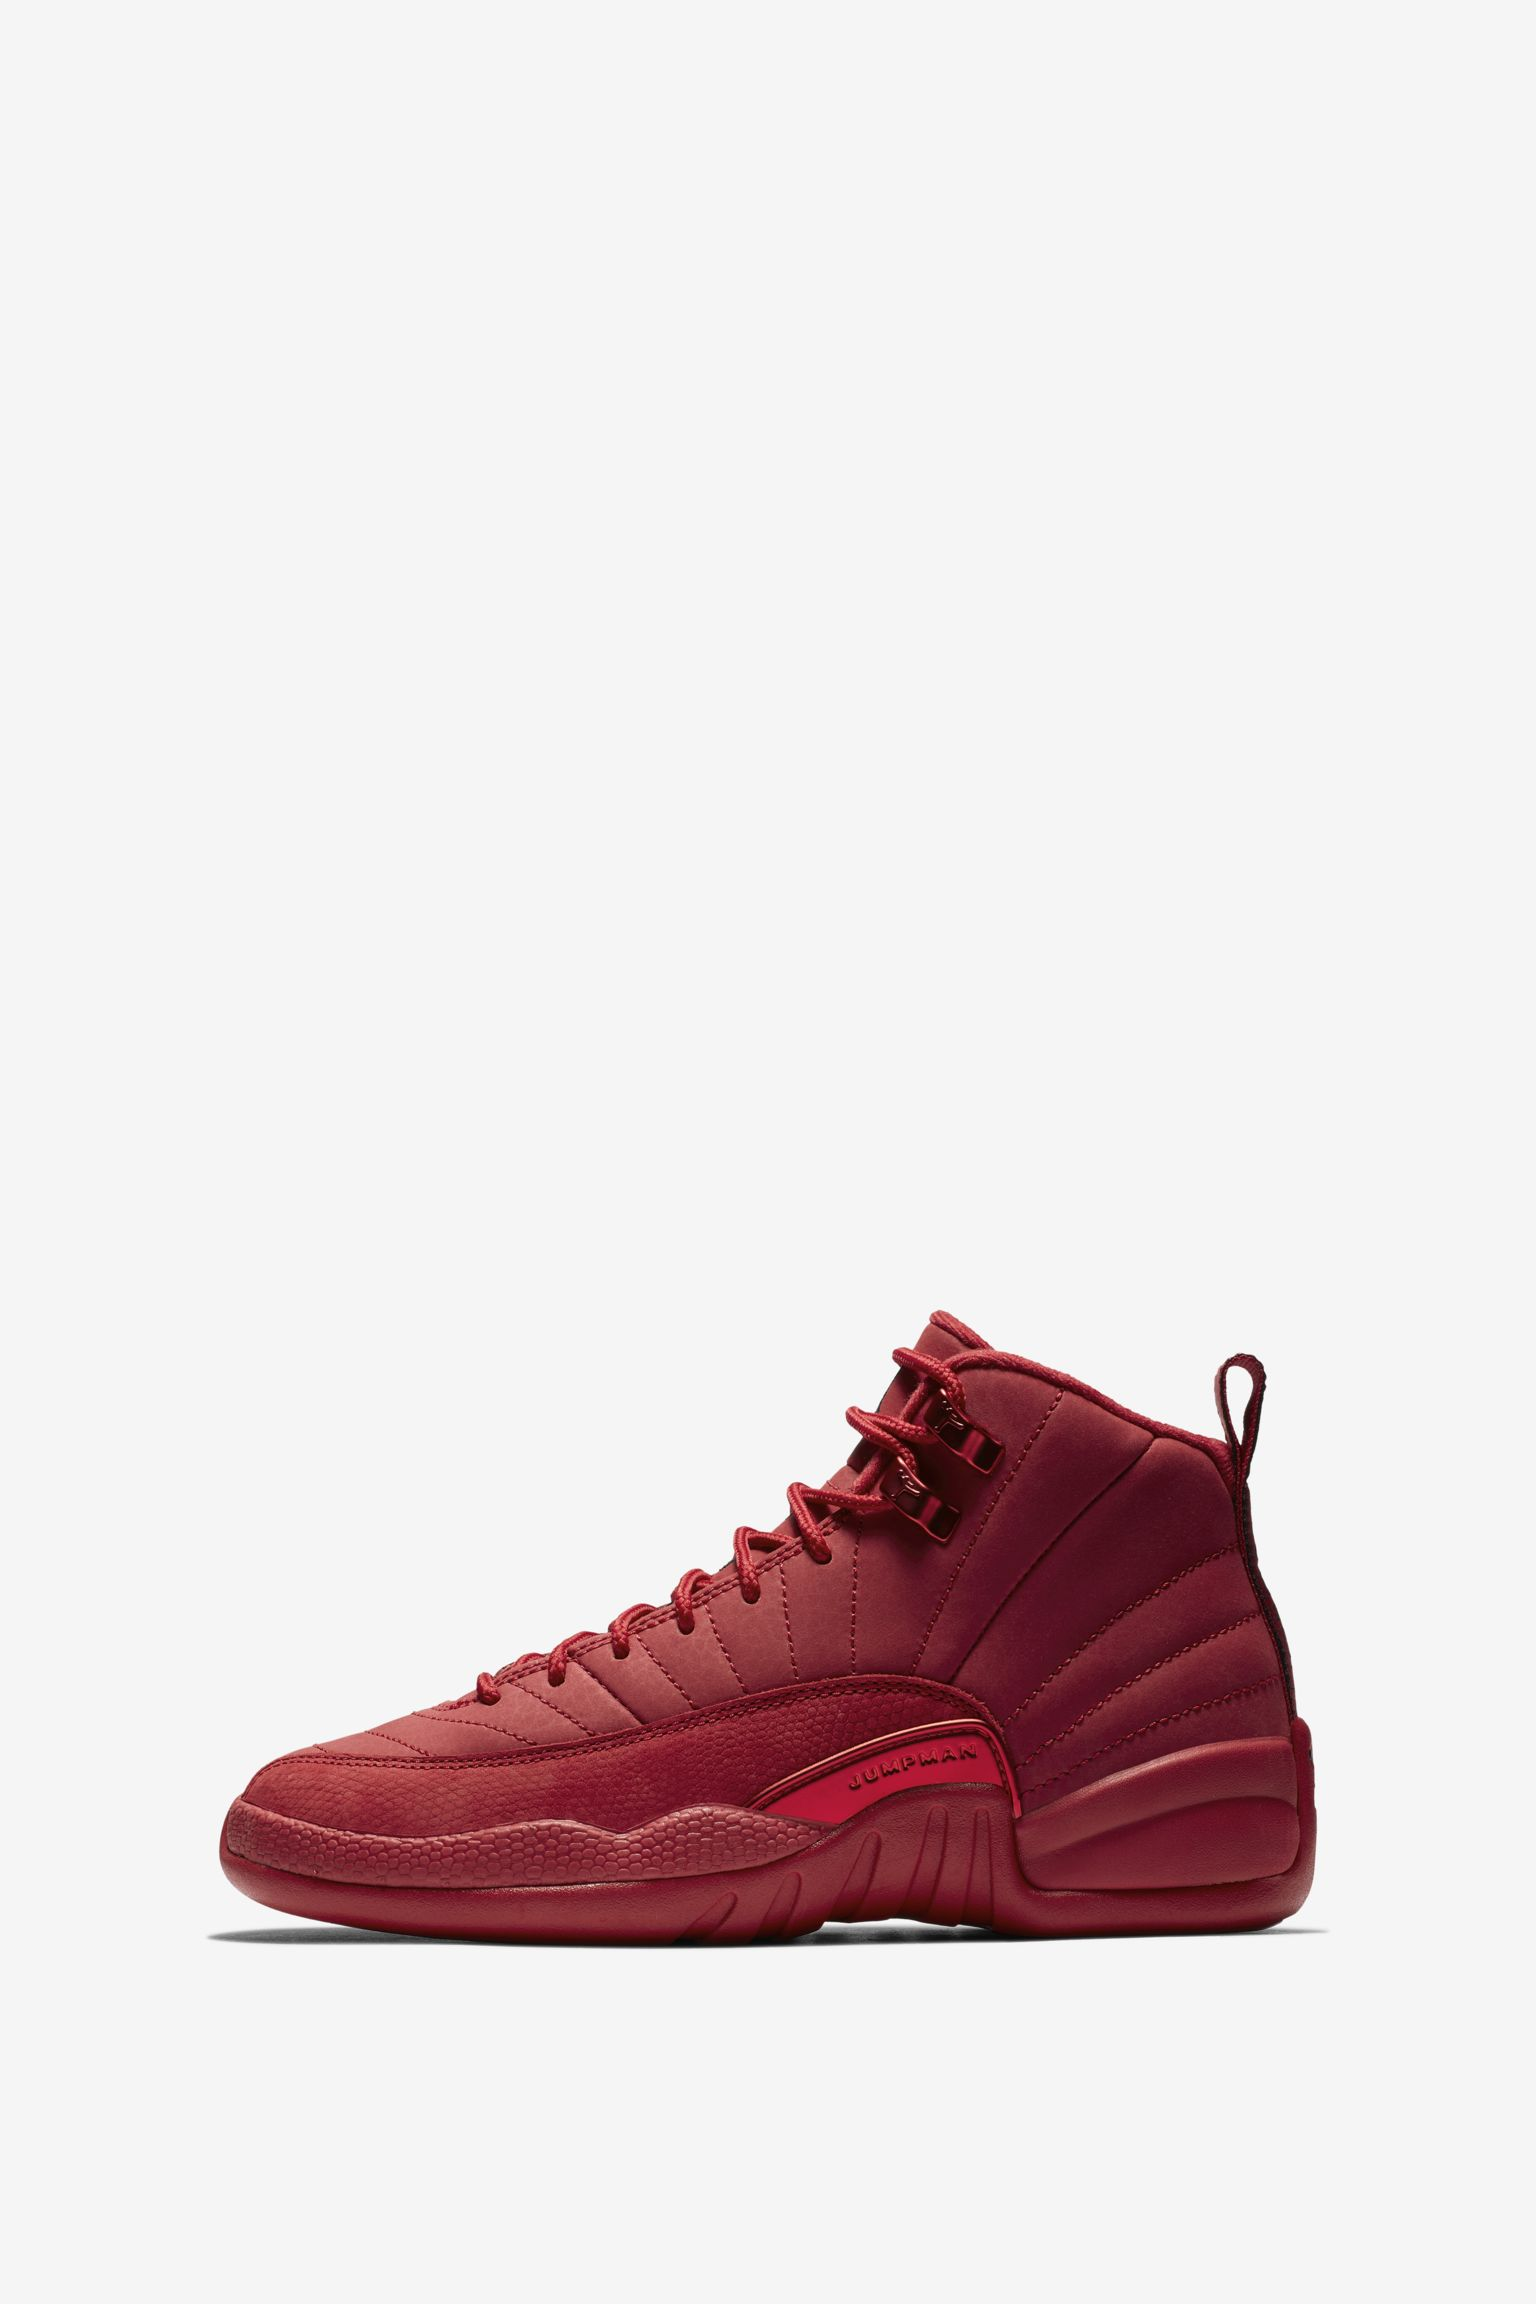 Air Jordan 12 Retro 'Gym Red & Black' Release Date. Nike SNKRS